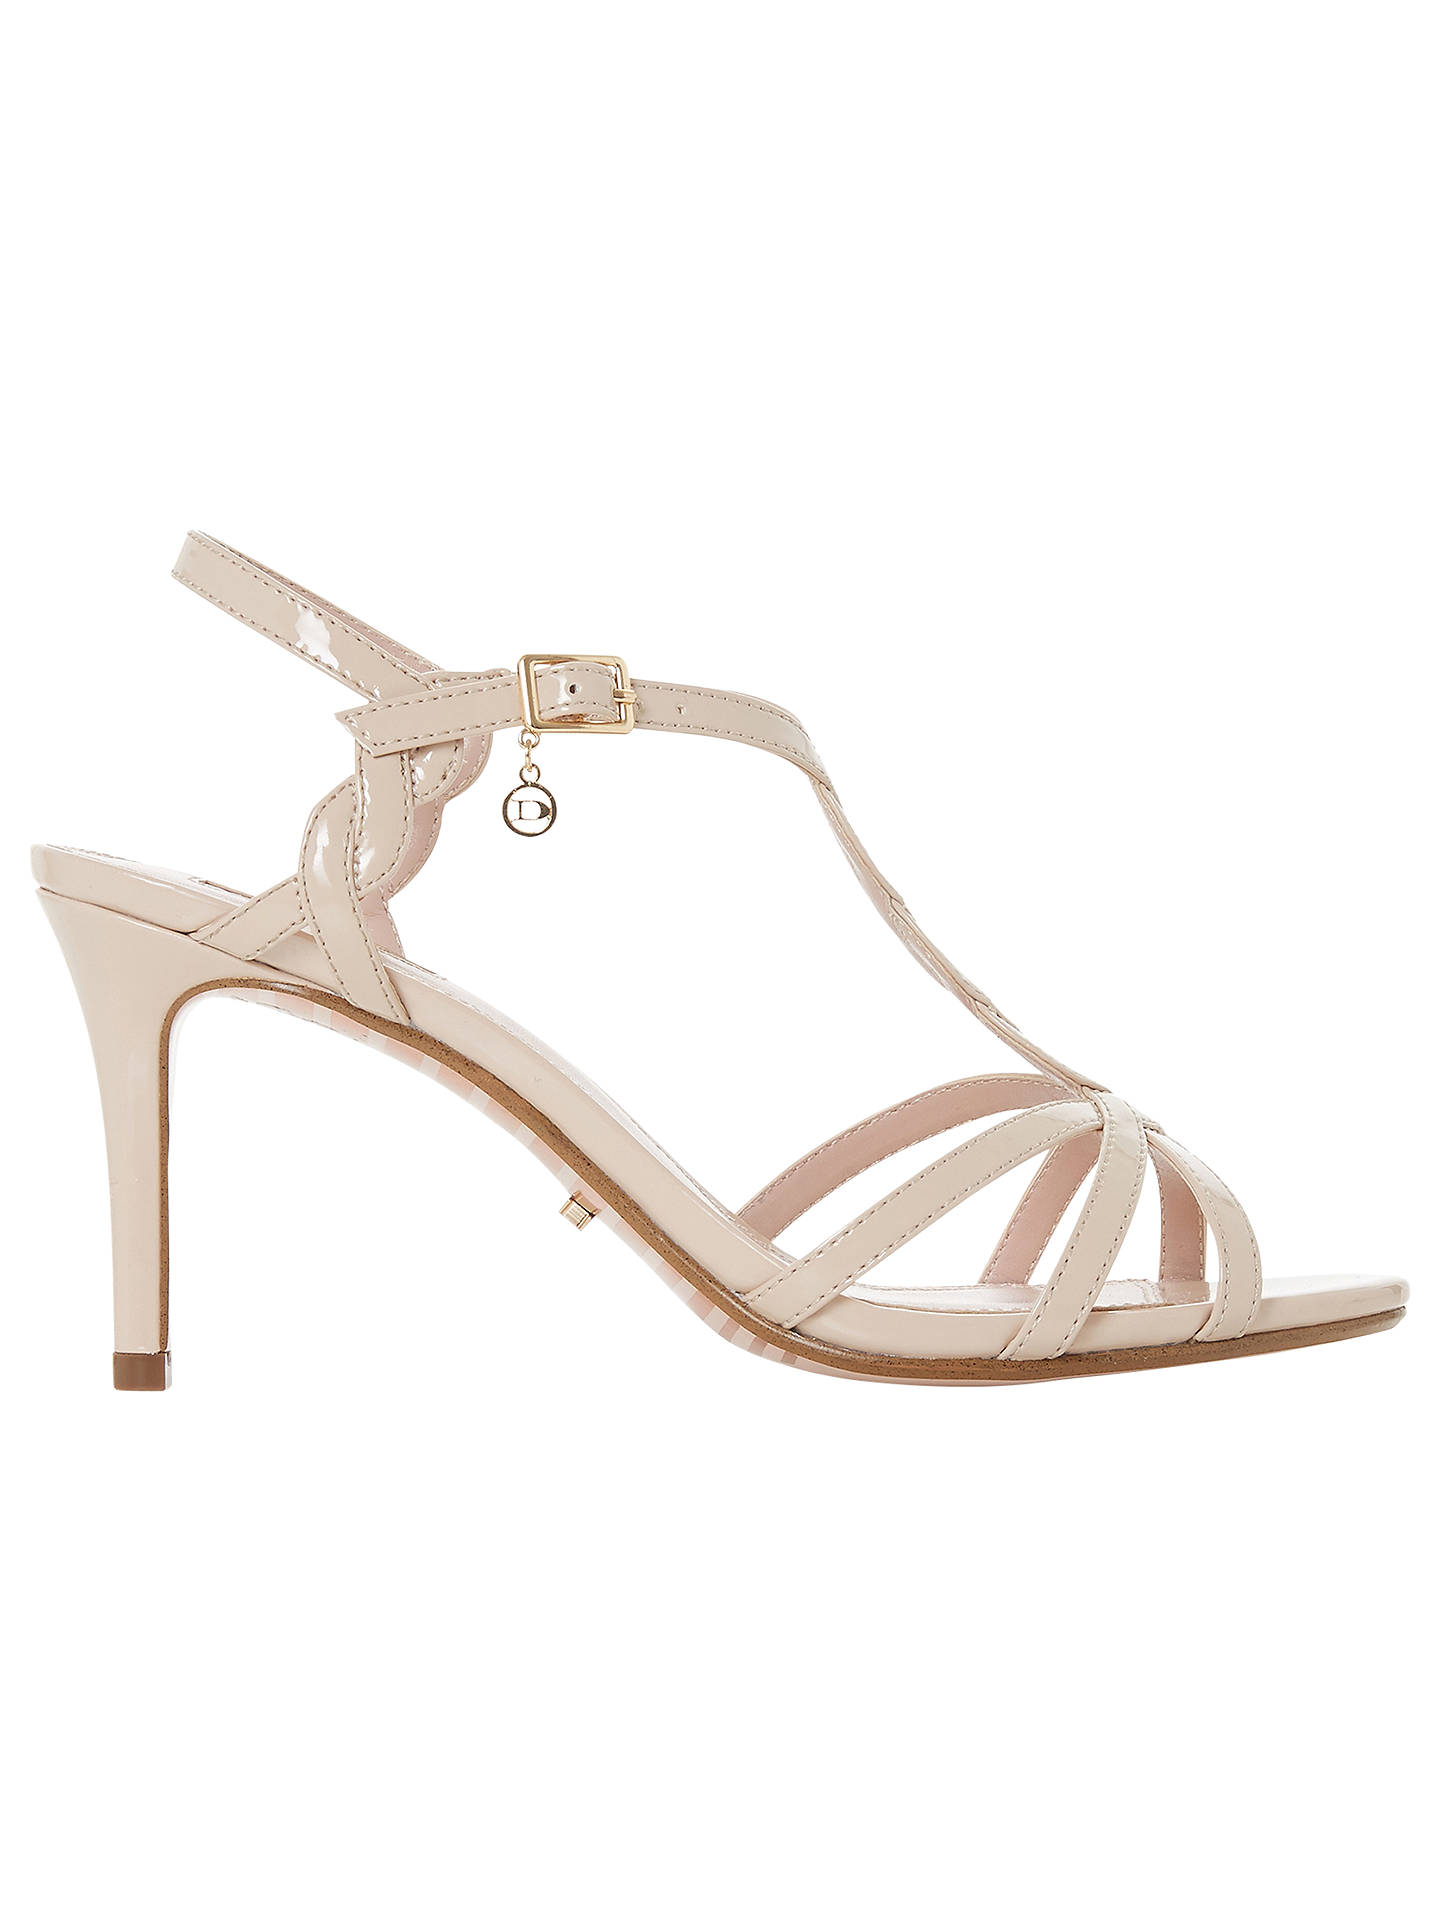 fdcf7415f52 Buy Dune Mystick Stiletto Heel Sandals